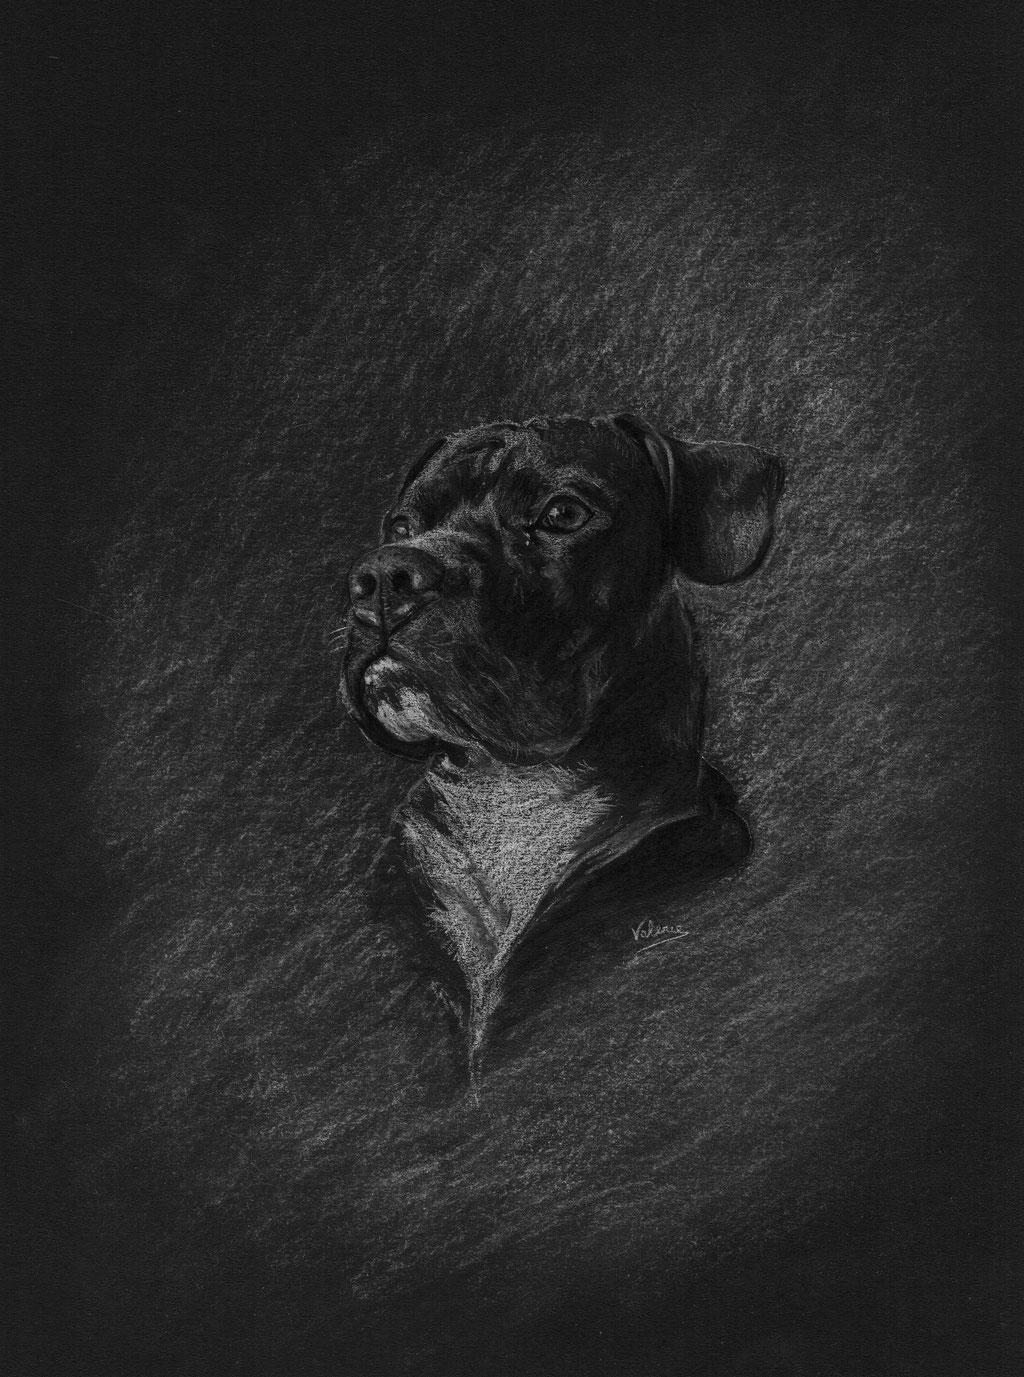 Dierenportret Pitbull: Wit potlood op zwart papier (2018)